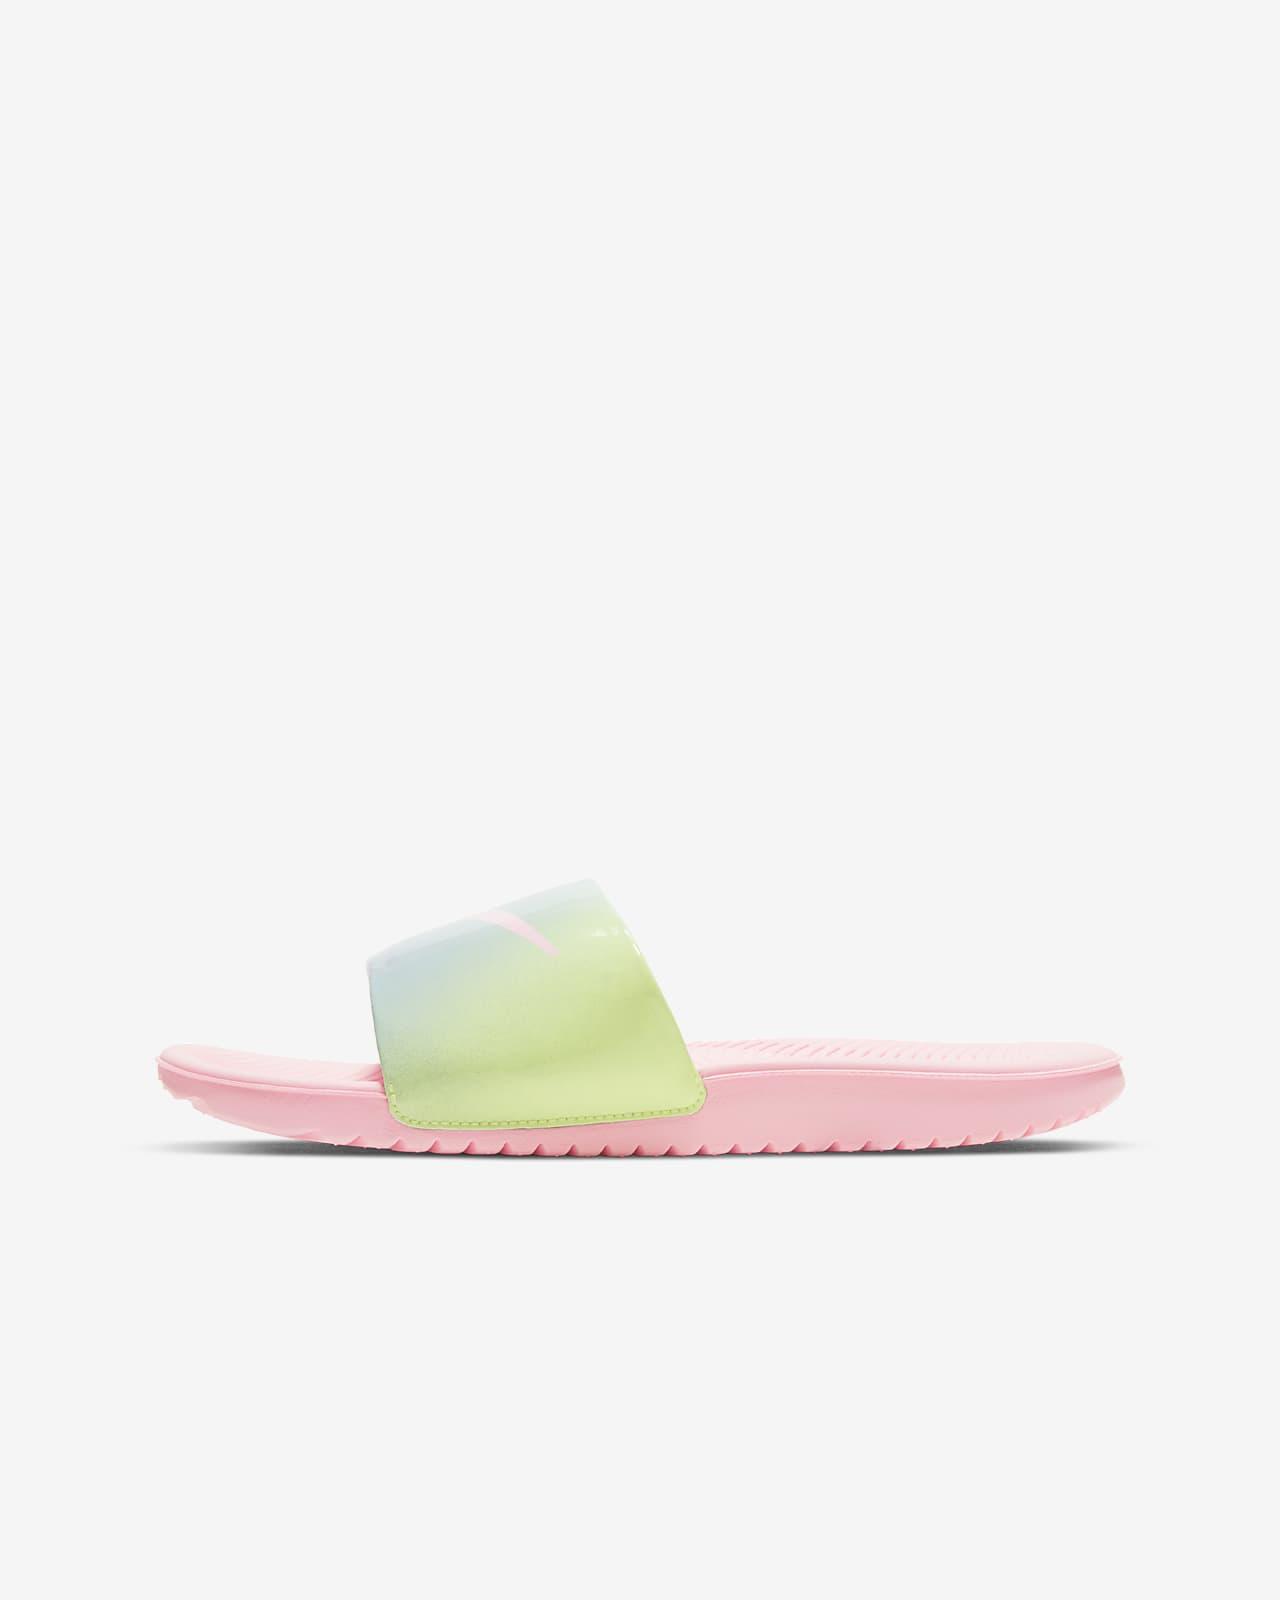 Nike Kawa SE2 Badeslipper für jüngere/ältere Kinder